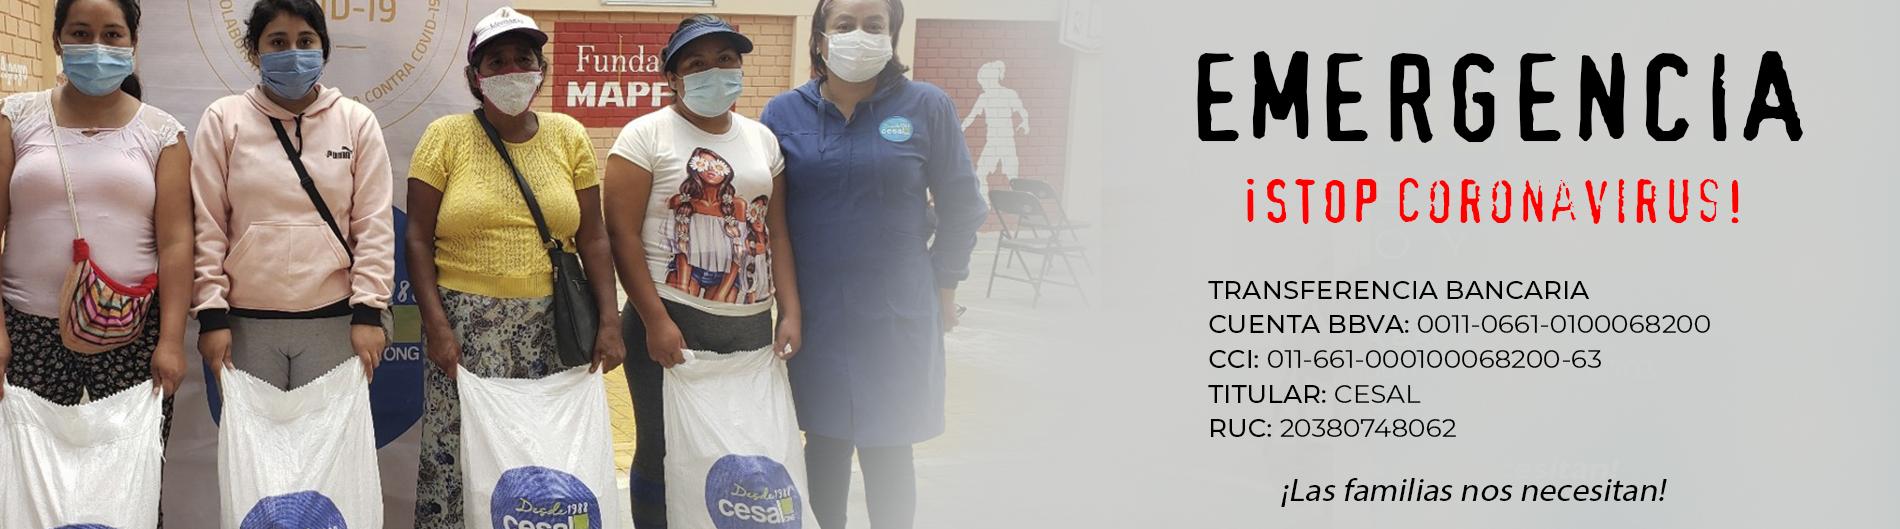 Campaña Stop Coronavirus